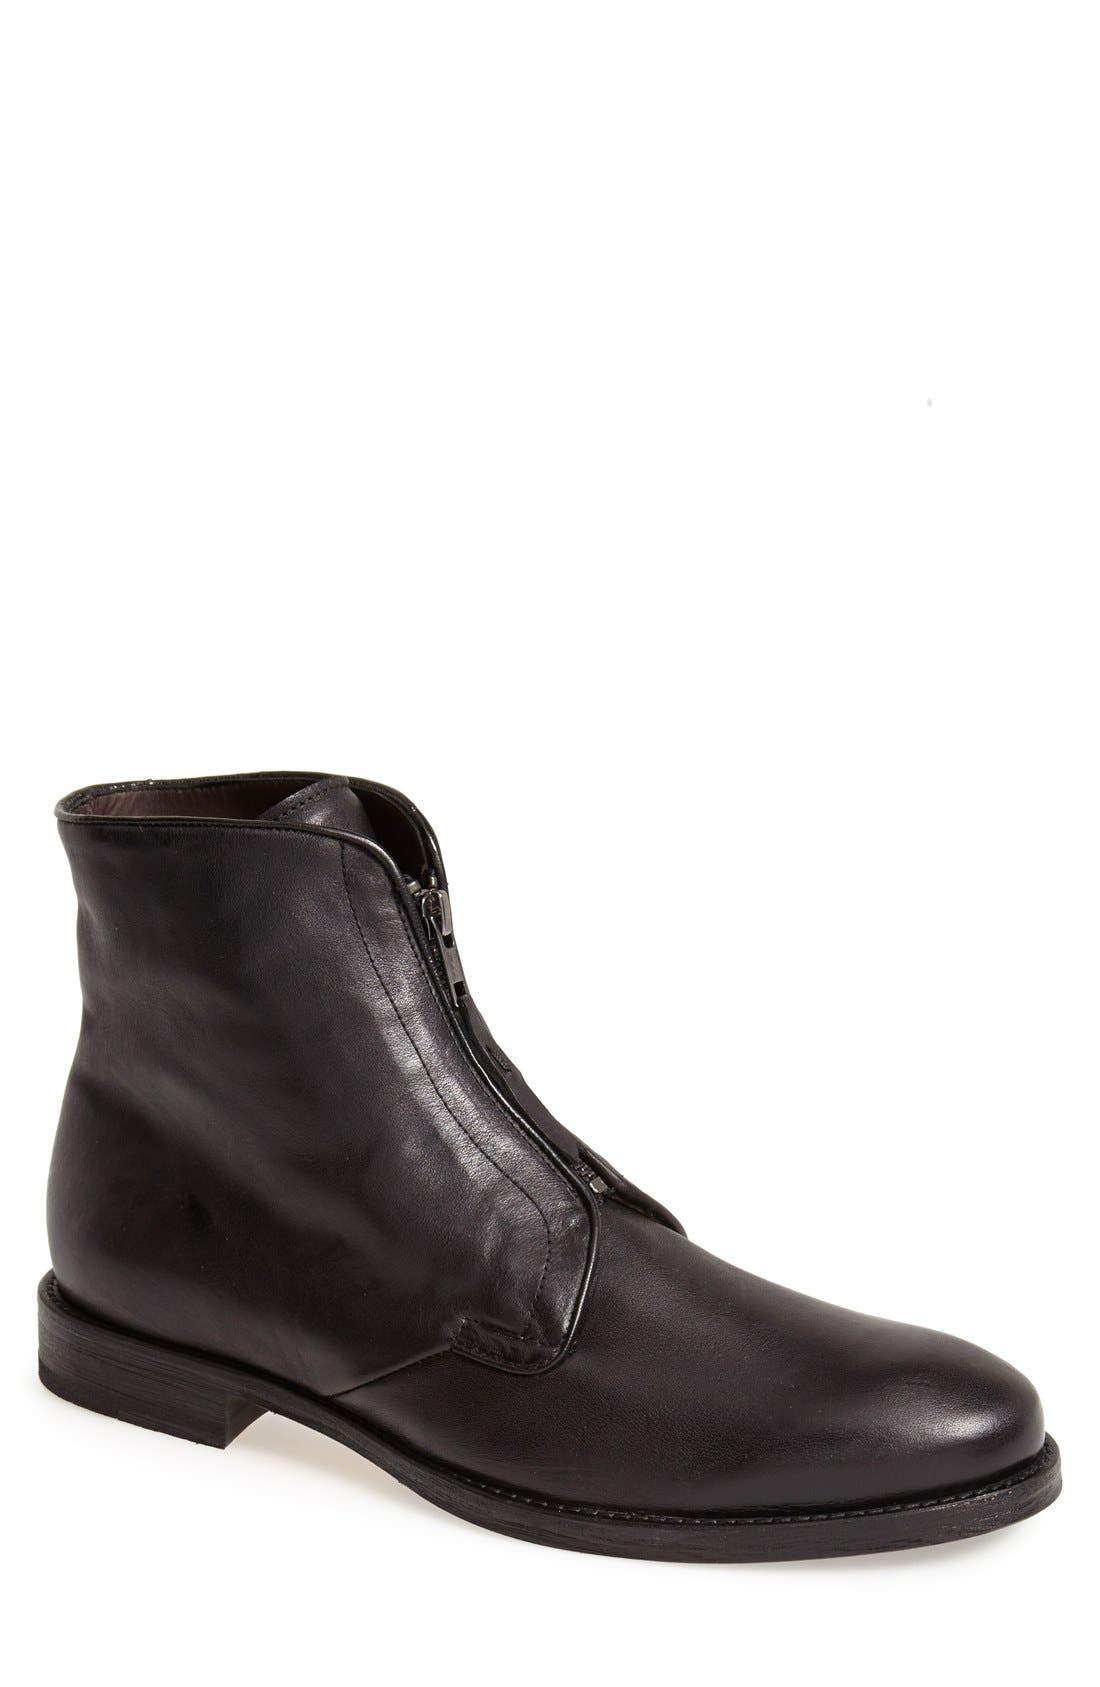 Alternate Image 1 Selected - Maison Forte 'Guerra' Zip Boot